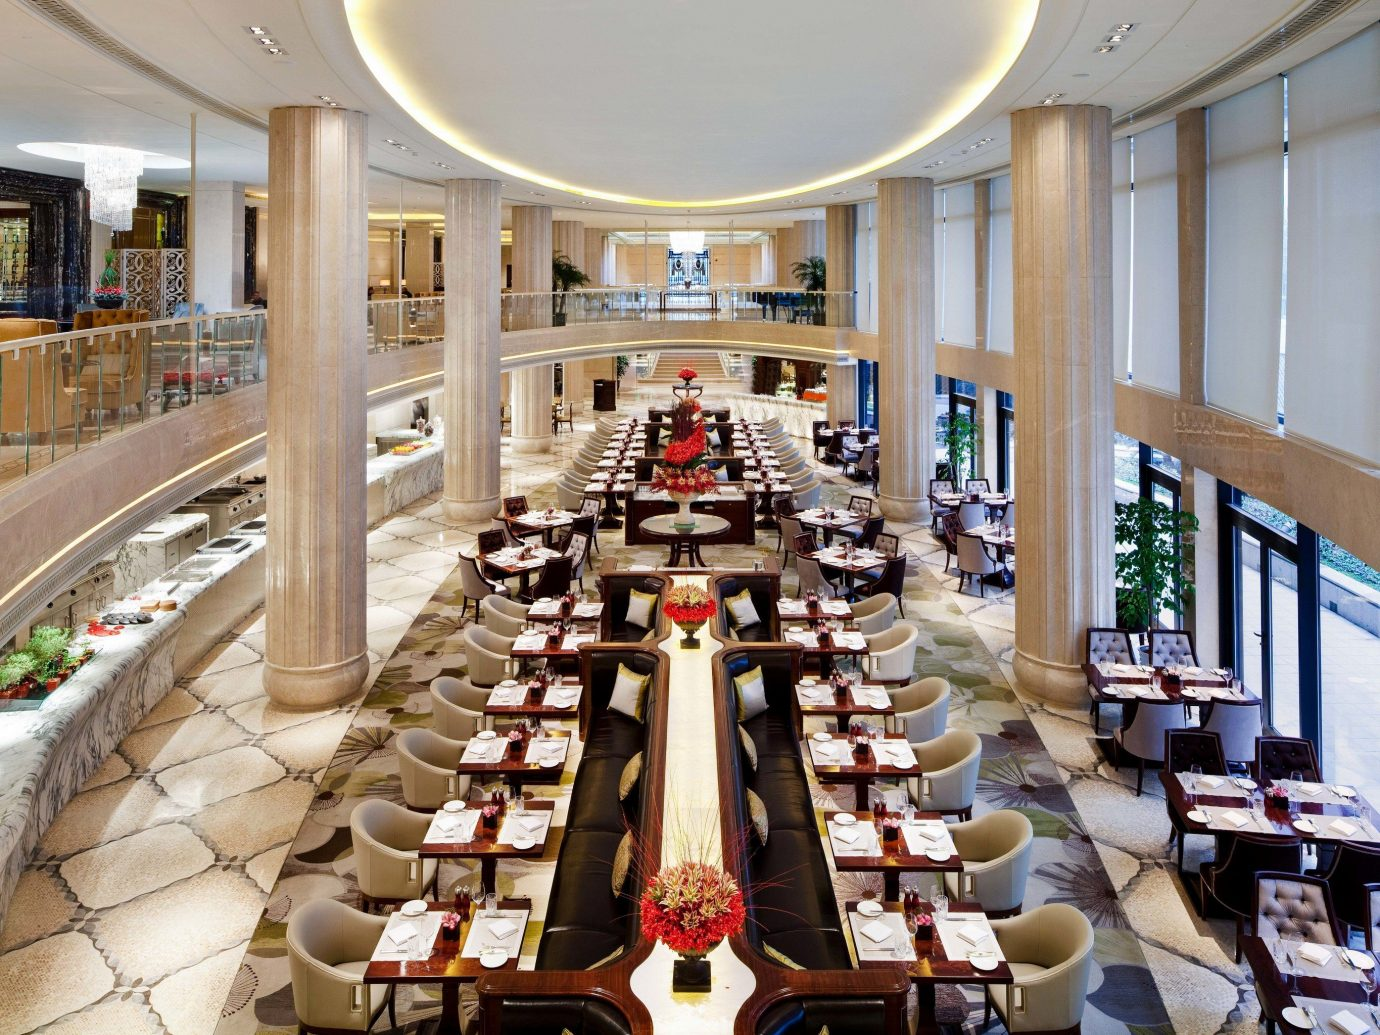 Boutique Hotels Luxury Travel indoor Lobby restaurant interior design furniture